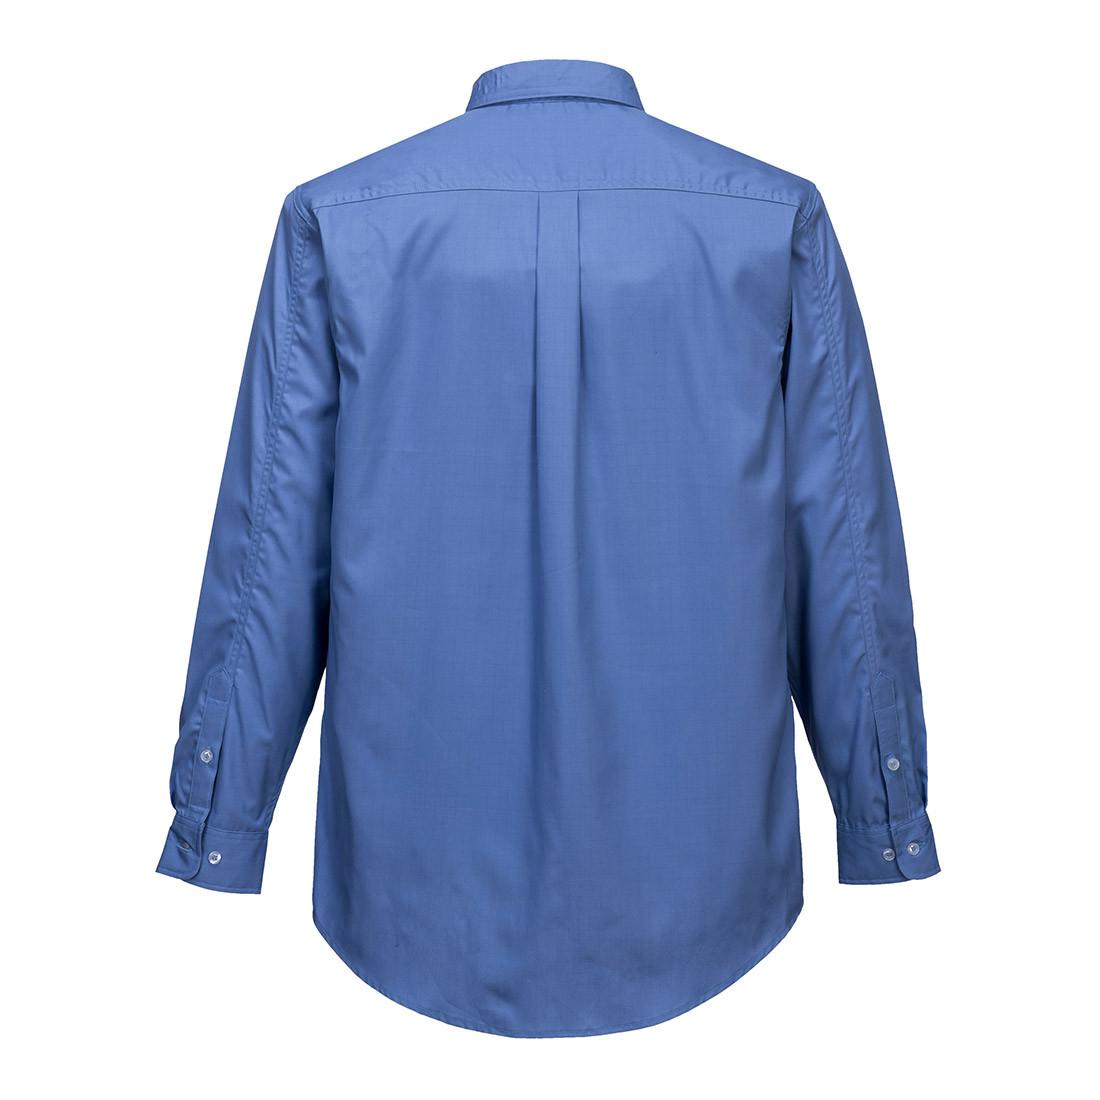 Camasa Bizflame Plus - Imbracaminte de protectie